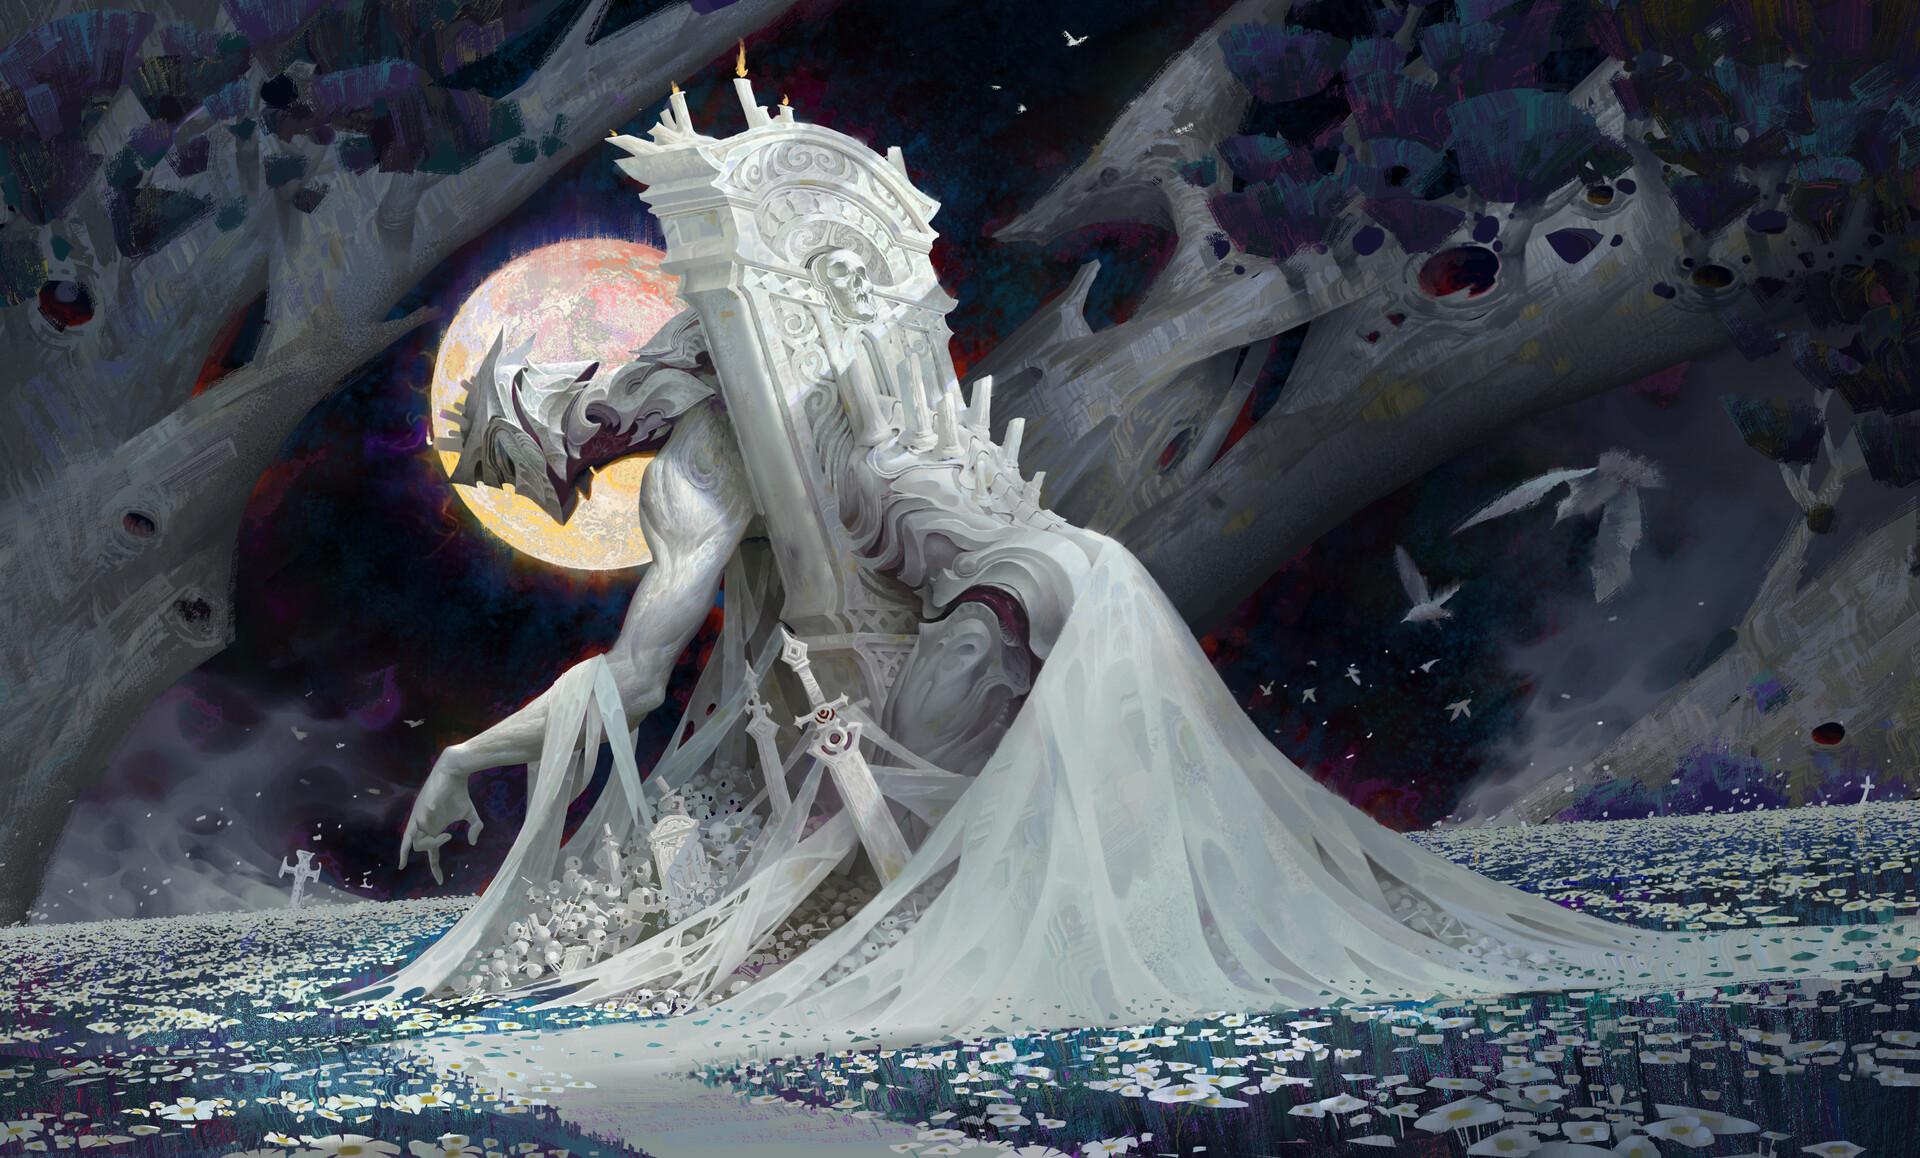 General 1920x1158 Ya lun digital art fantasy art sword Moon grave flowers birds skull